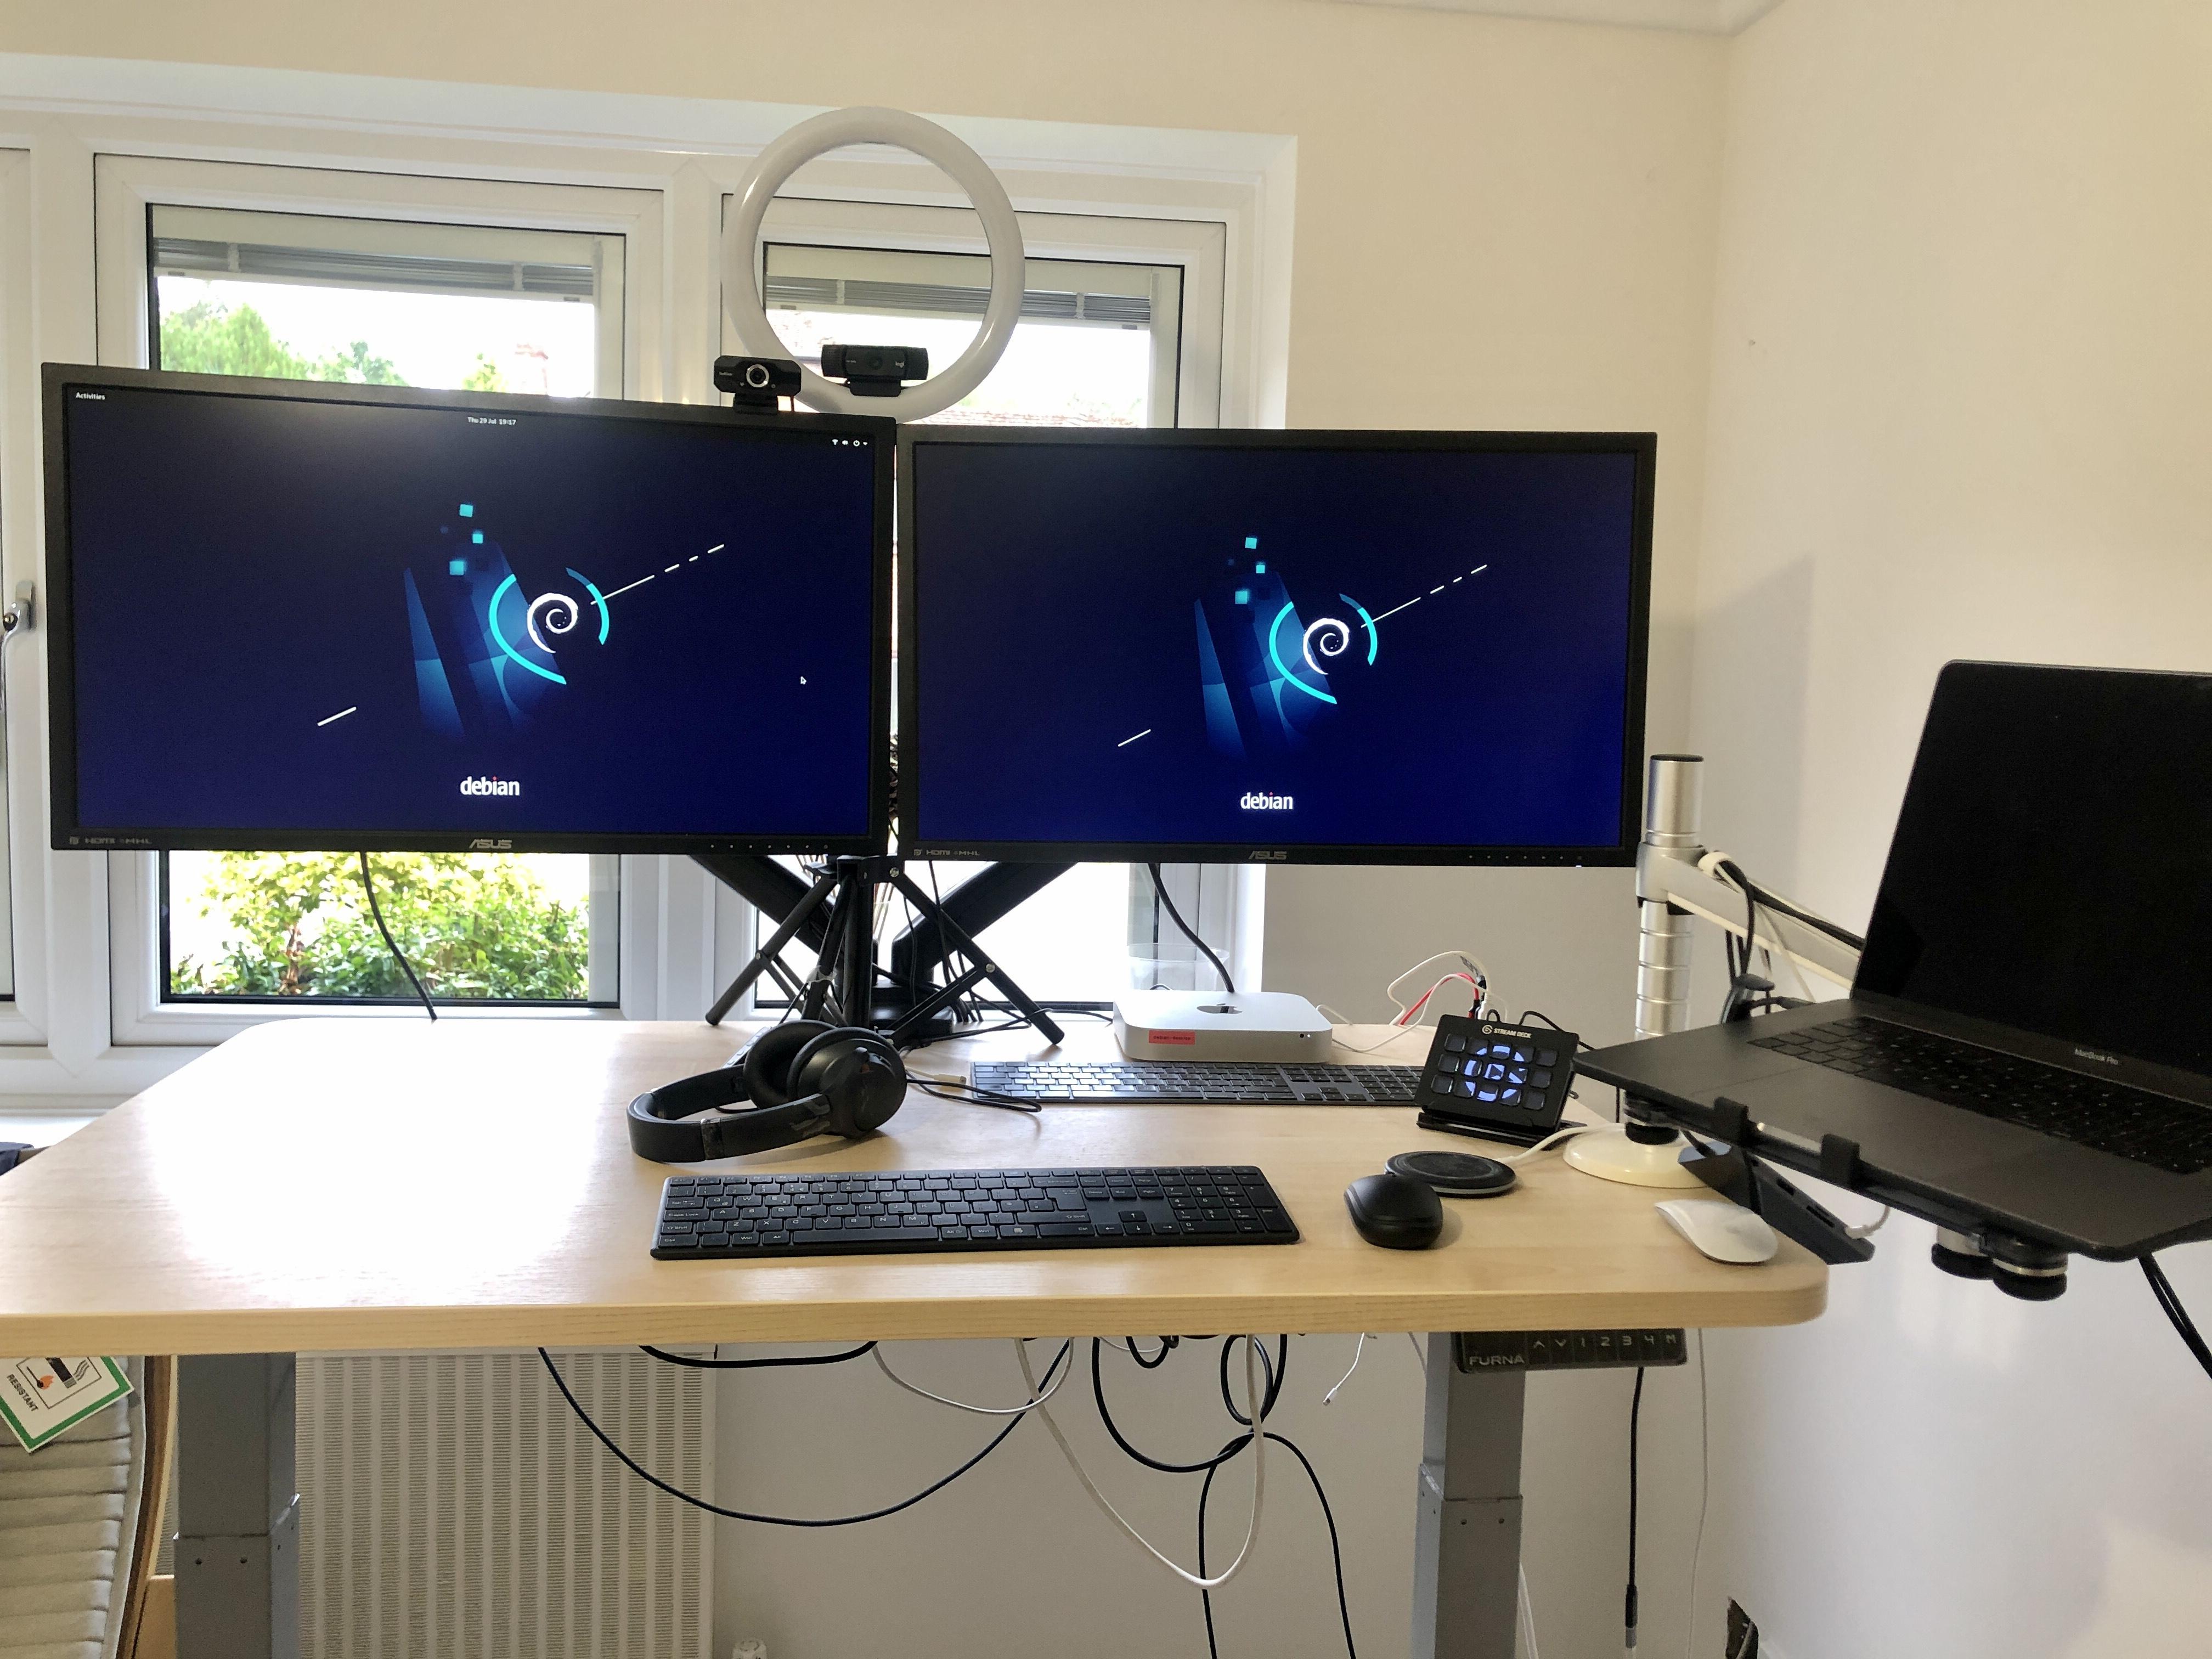 Mac Mini running Debian 11 Bullseye on two 4K screens